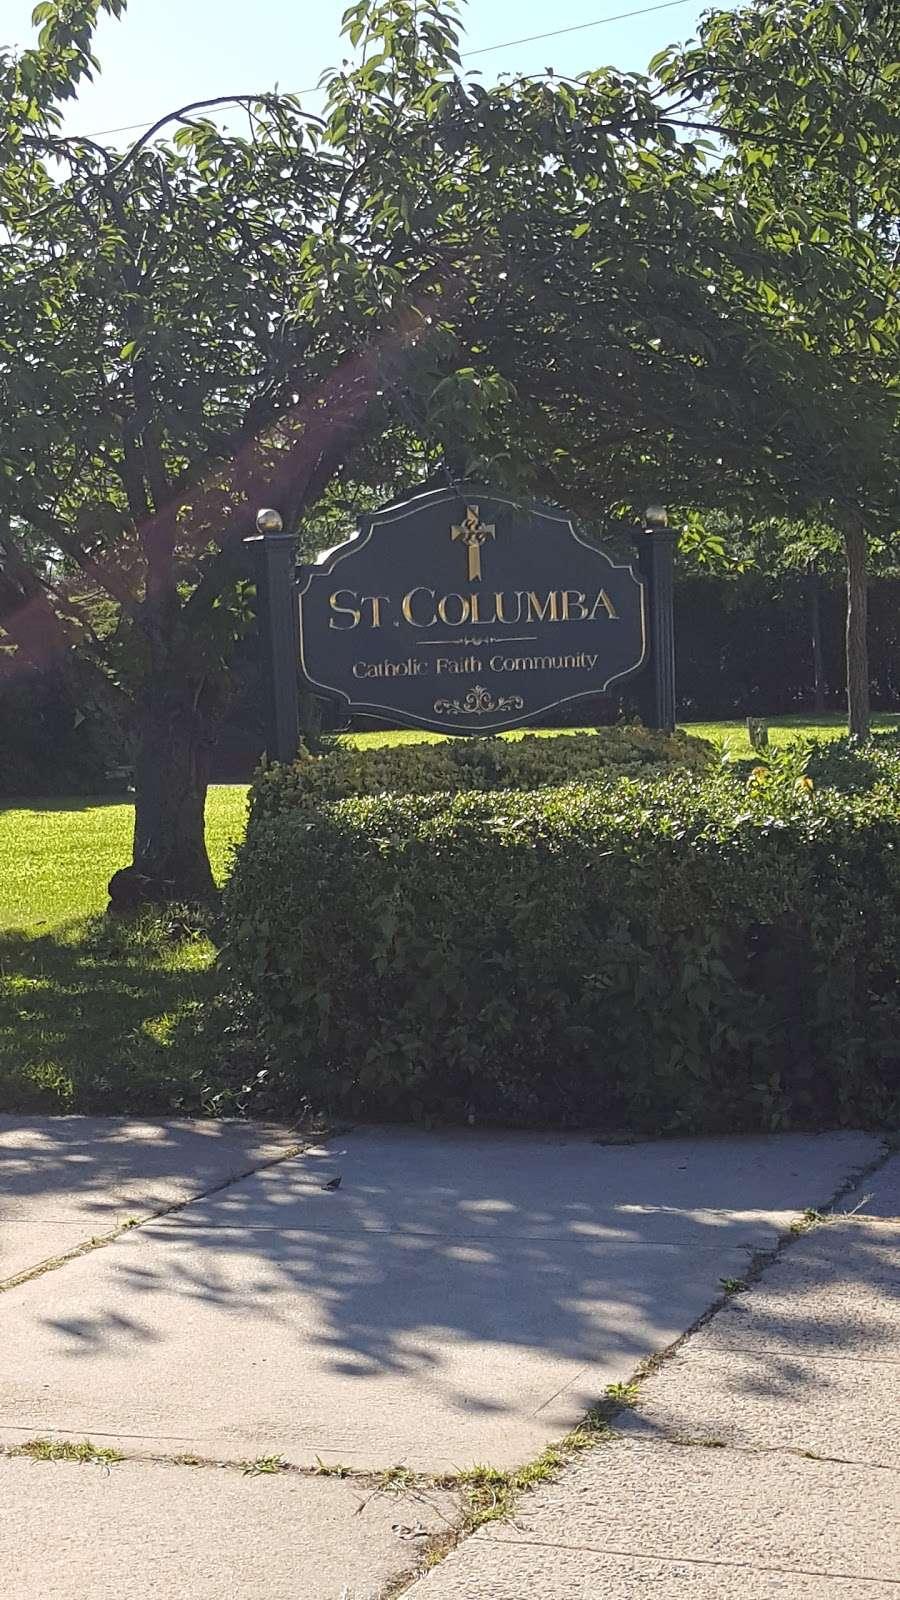 St Columba Church - church    Photo 8 of 10   Address: 2245 Kimball St, Brooklyn, NY 11234, USA   Phone: (718) 338-6265